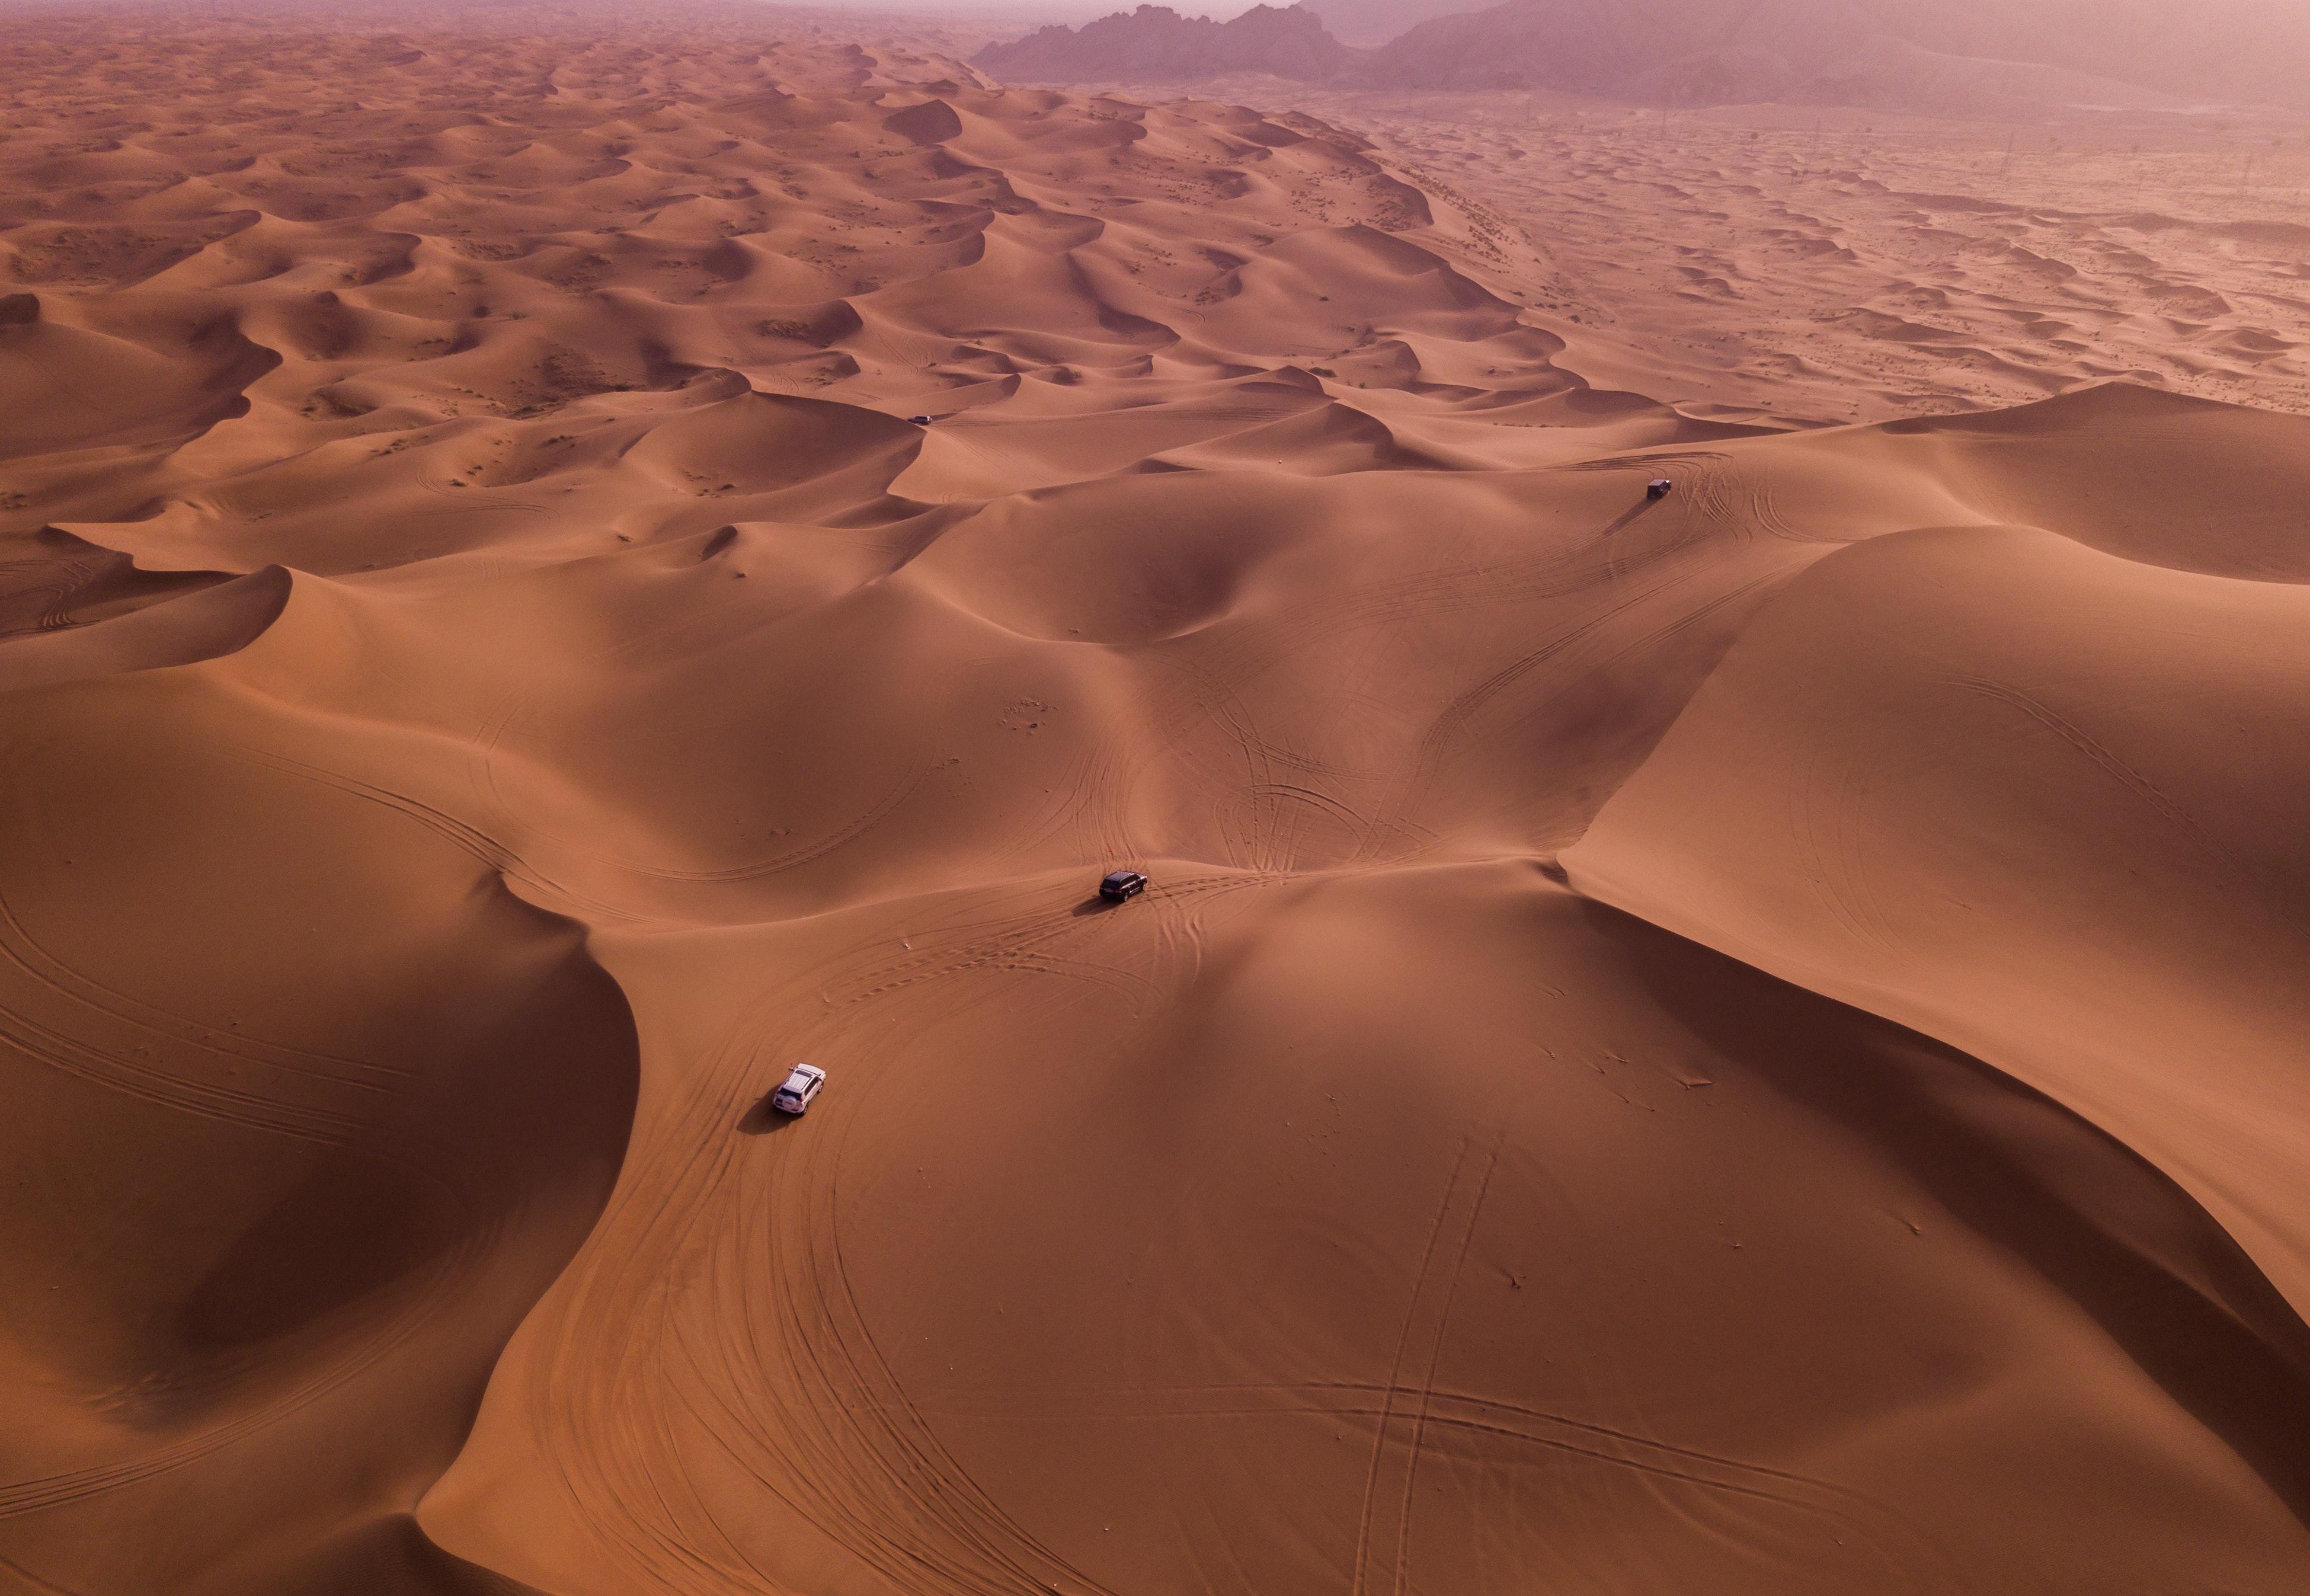 Two vehicles on desert dunes photo